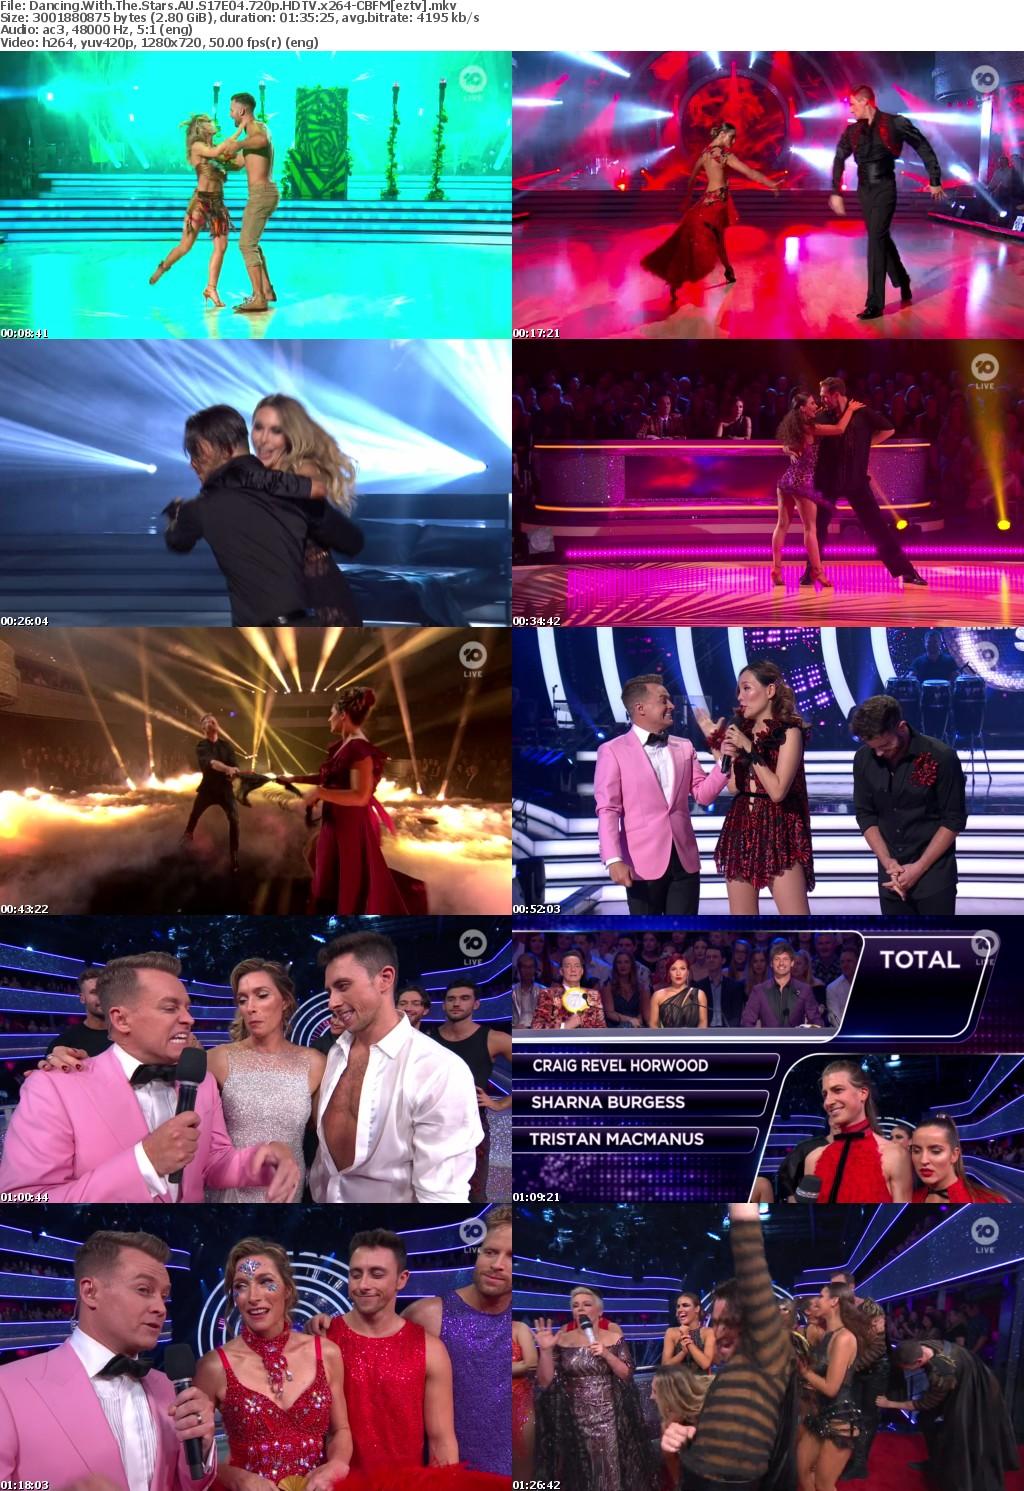 Dancing With The Stars AU S17E04 720p HDTV x264-CBFM